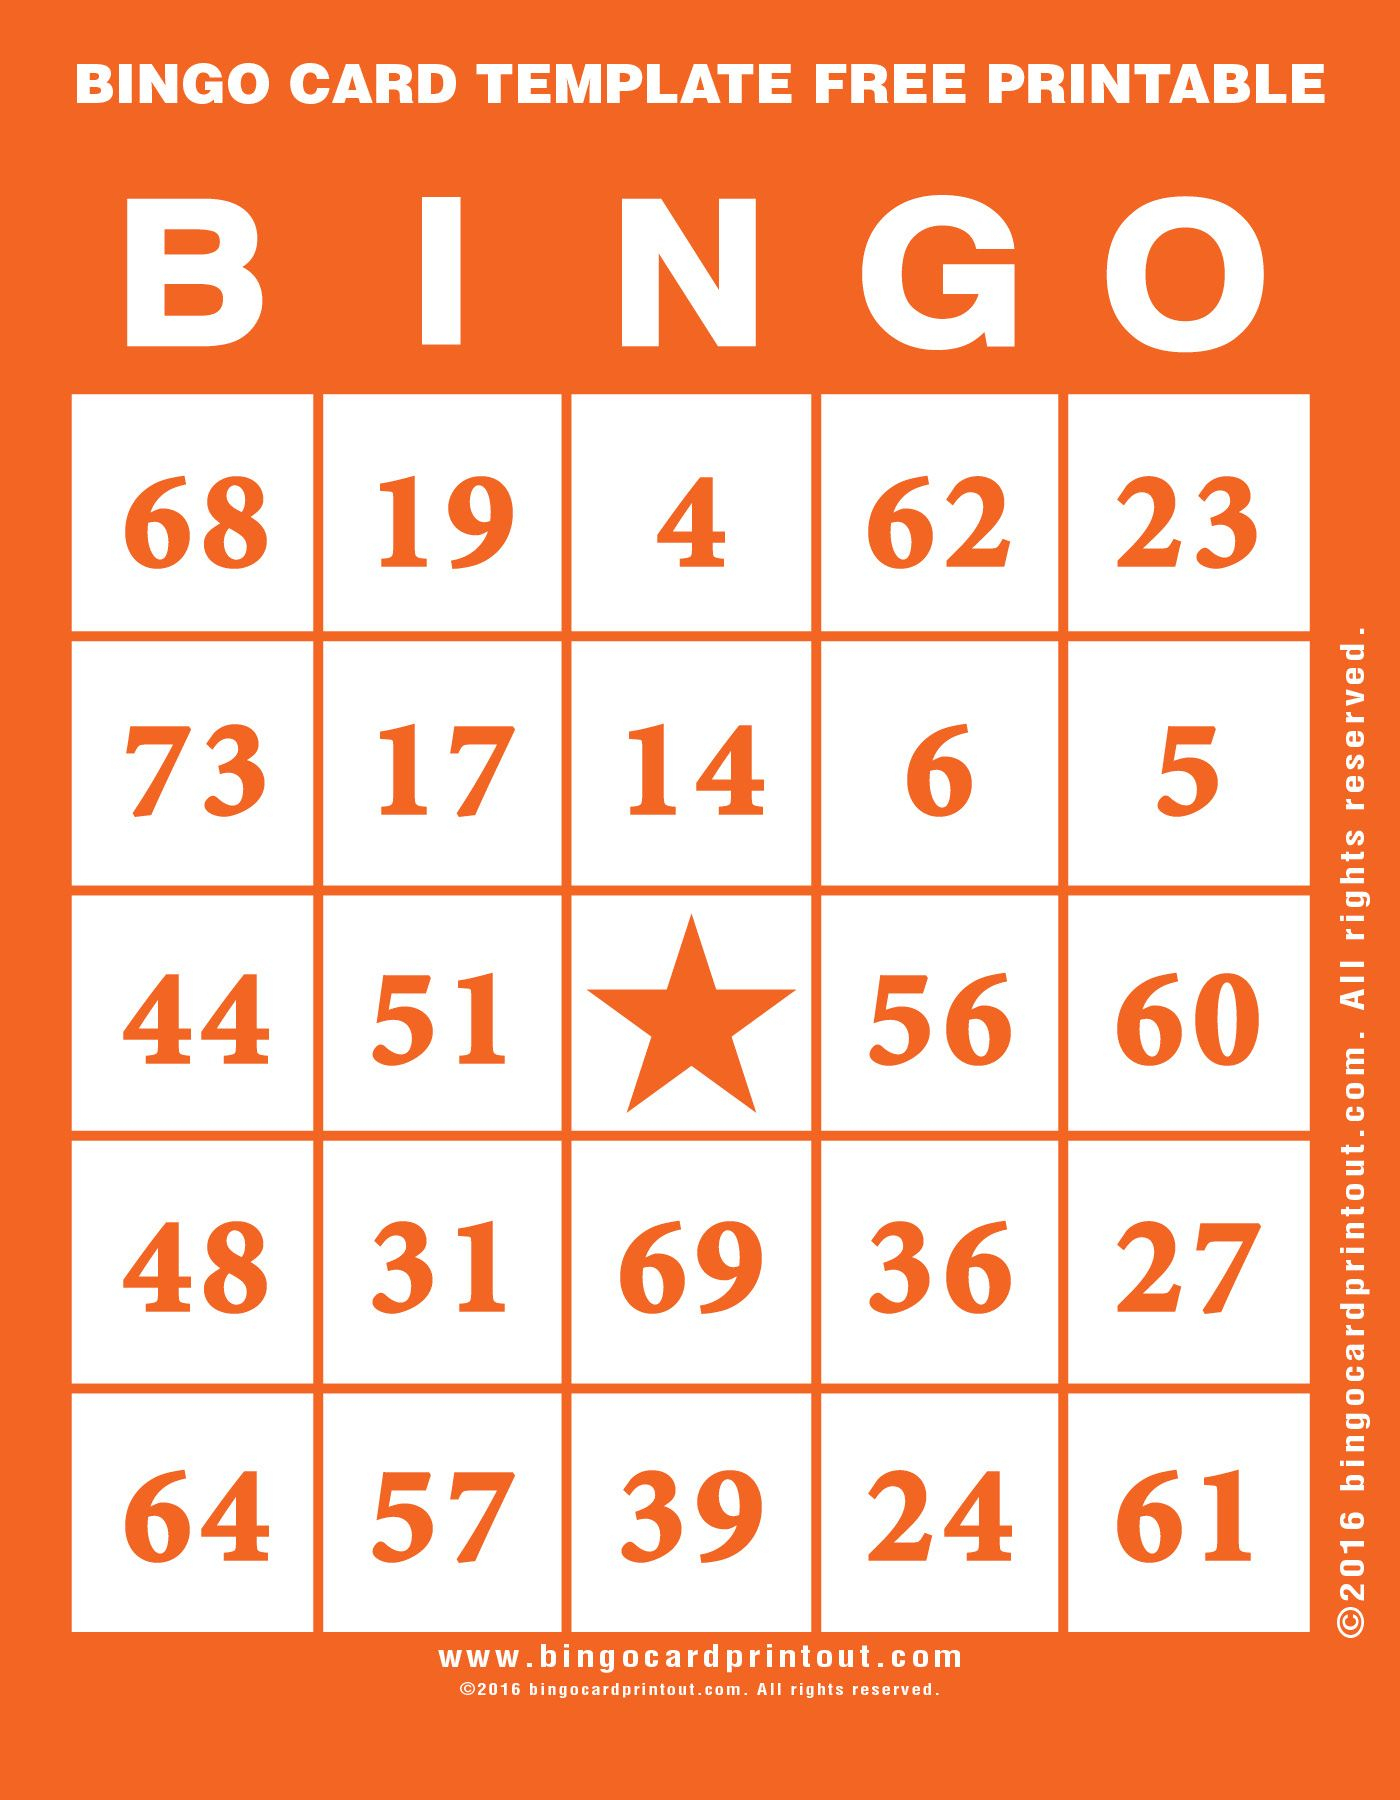 Bingo Card Template Free Printable   Bingo Card Template